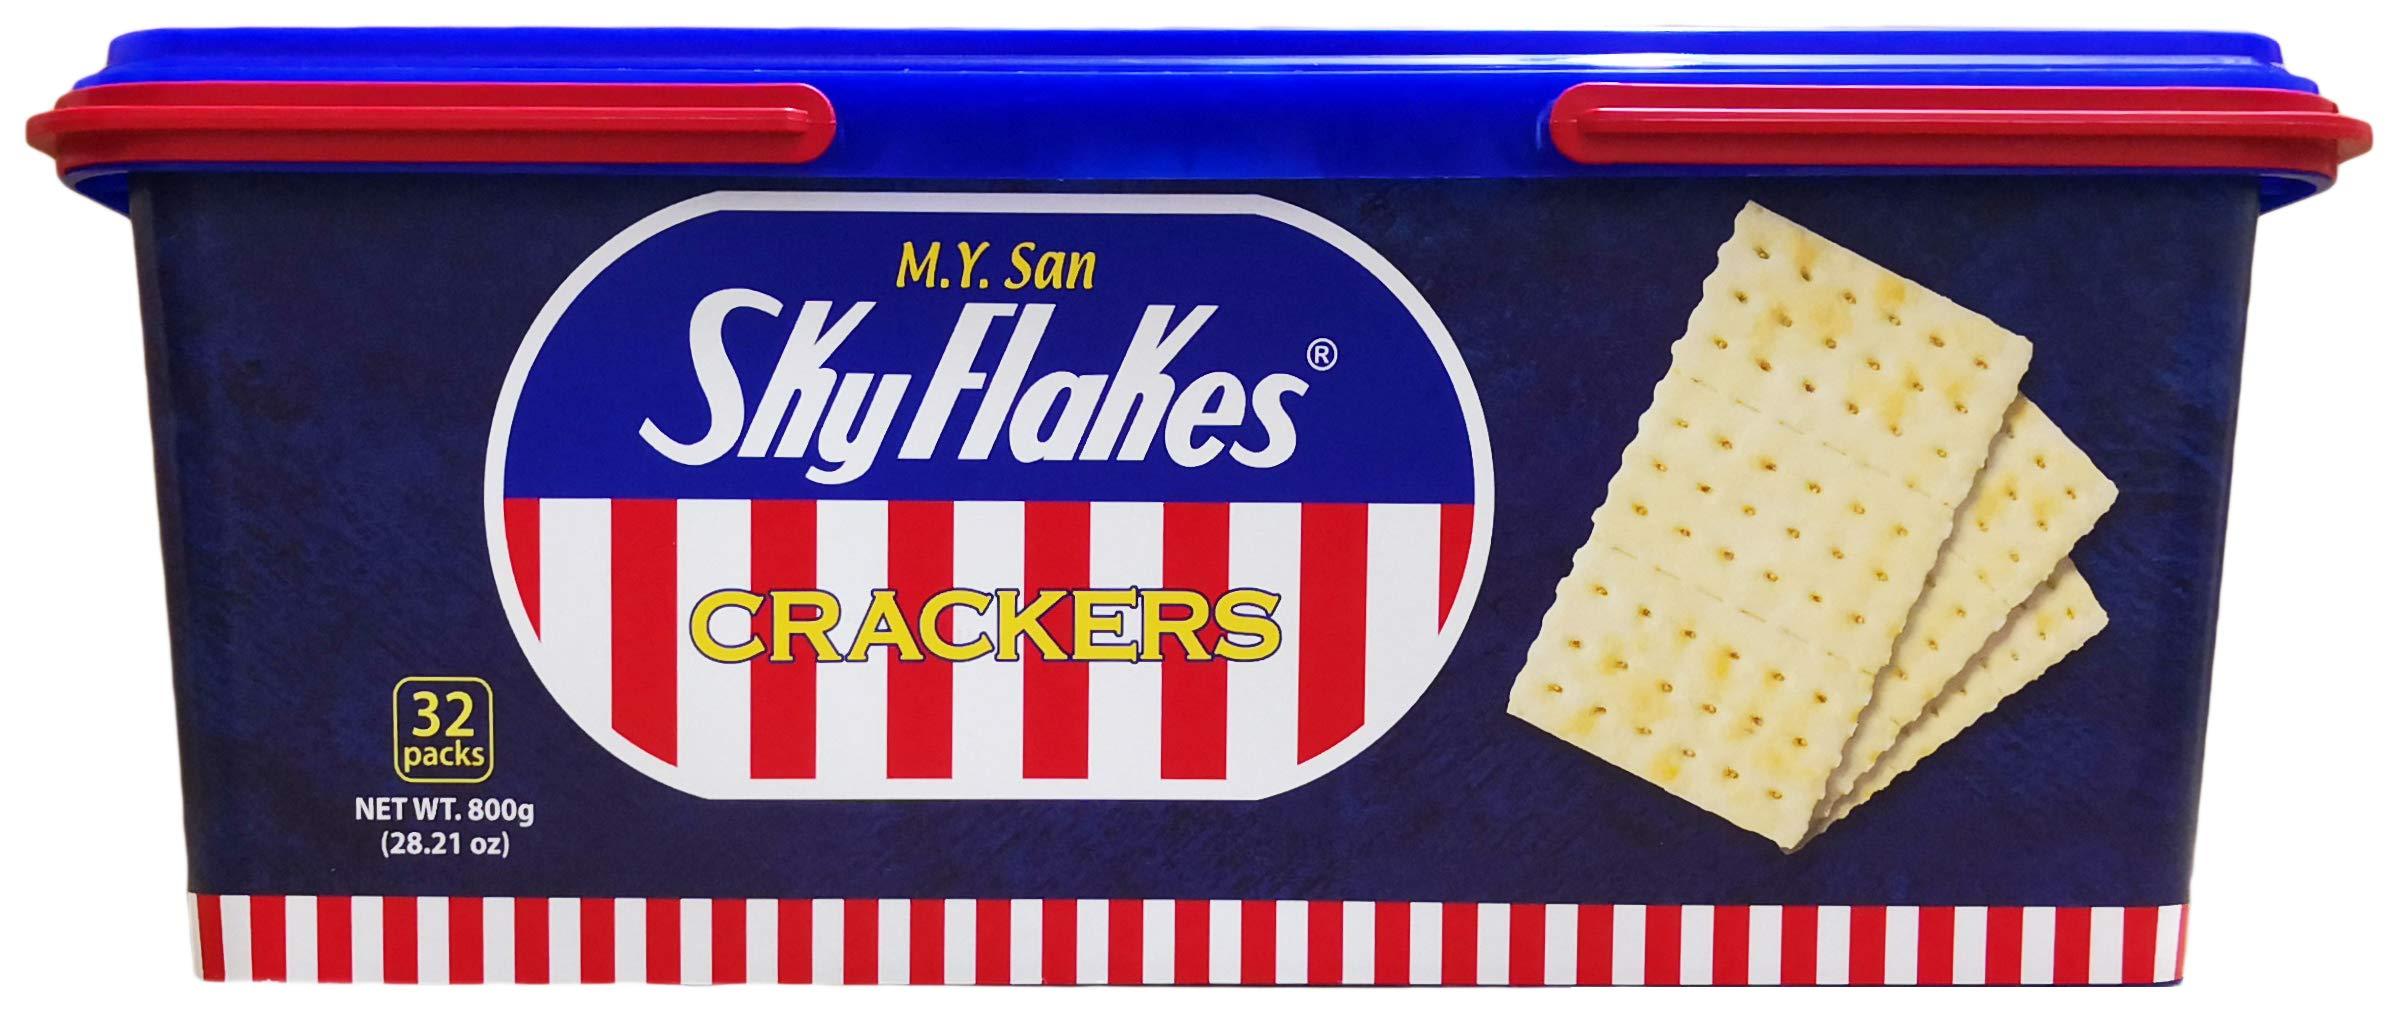 Sky Flakes Crackers (28.21 oz) 800g